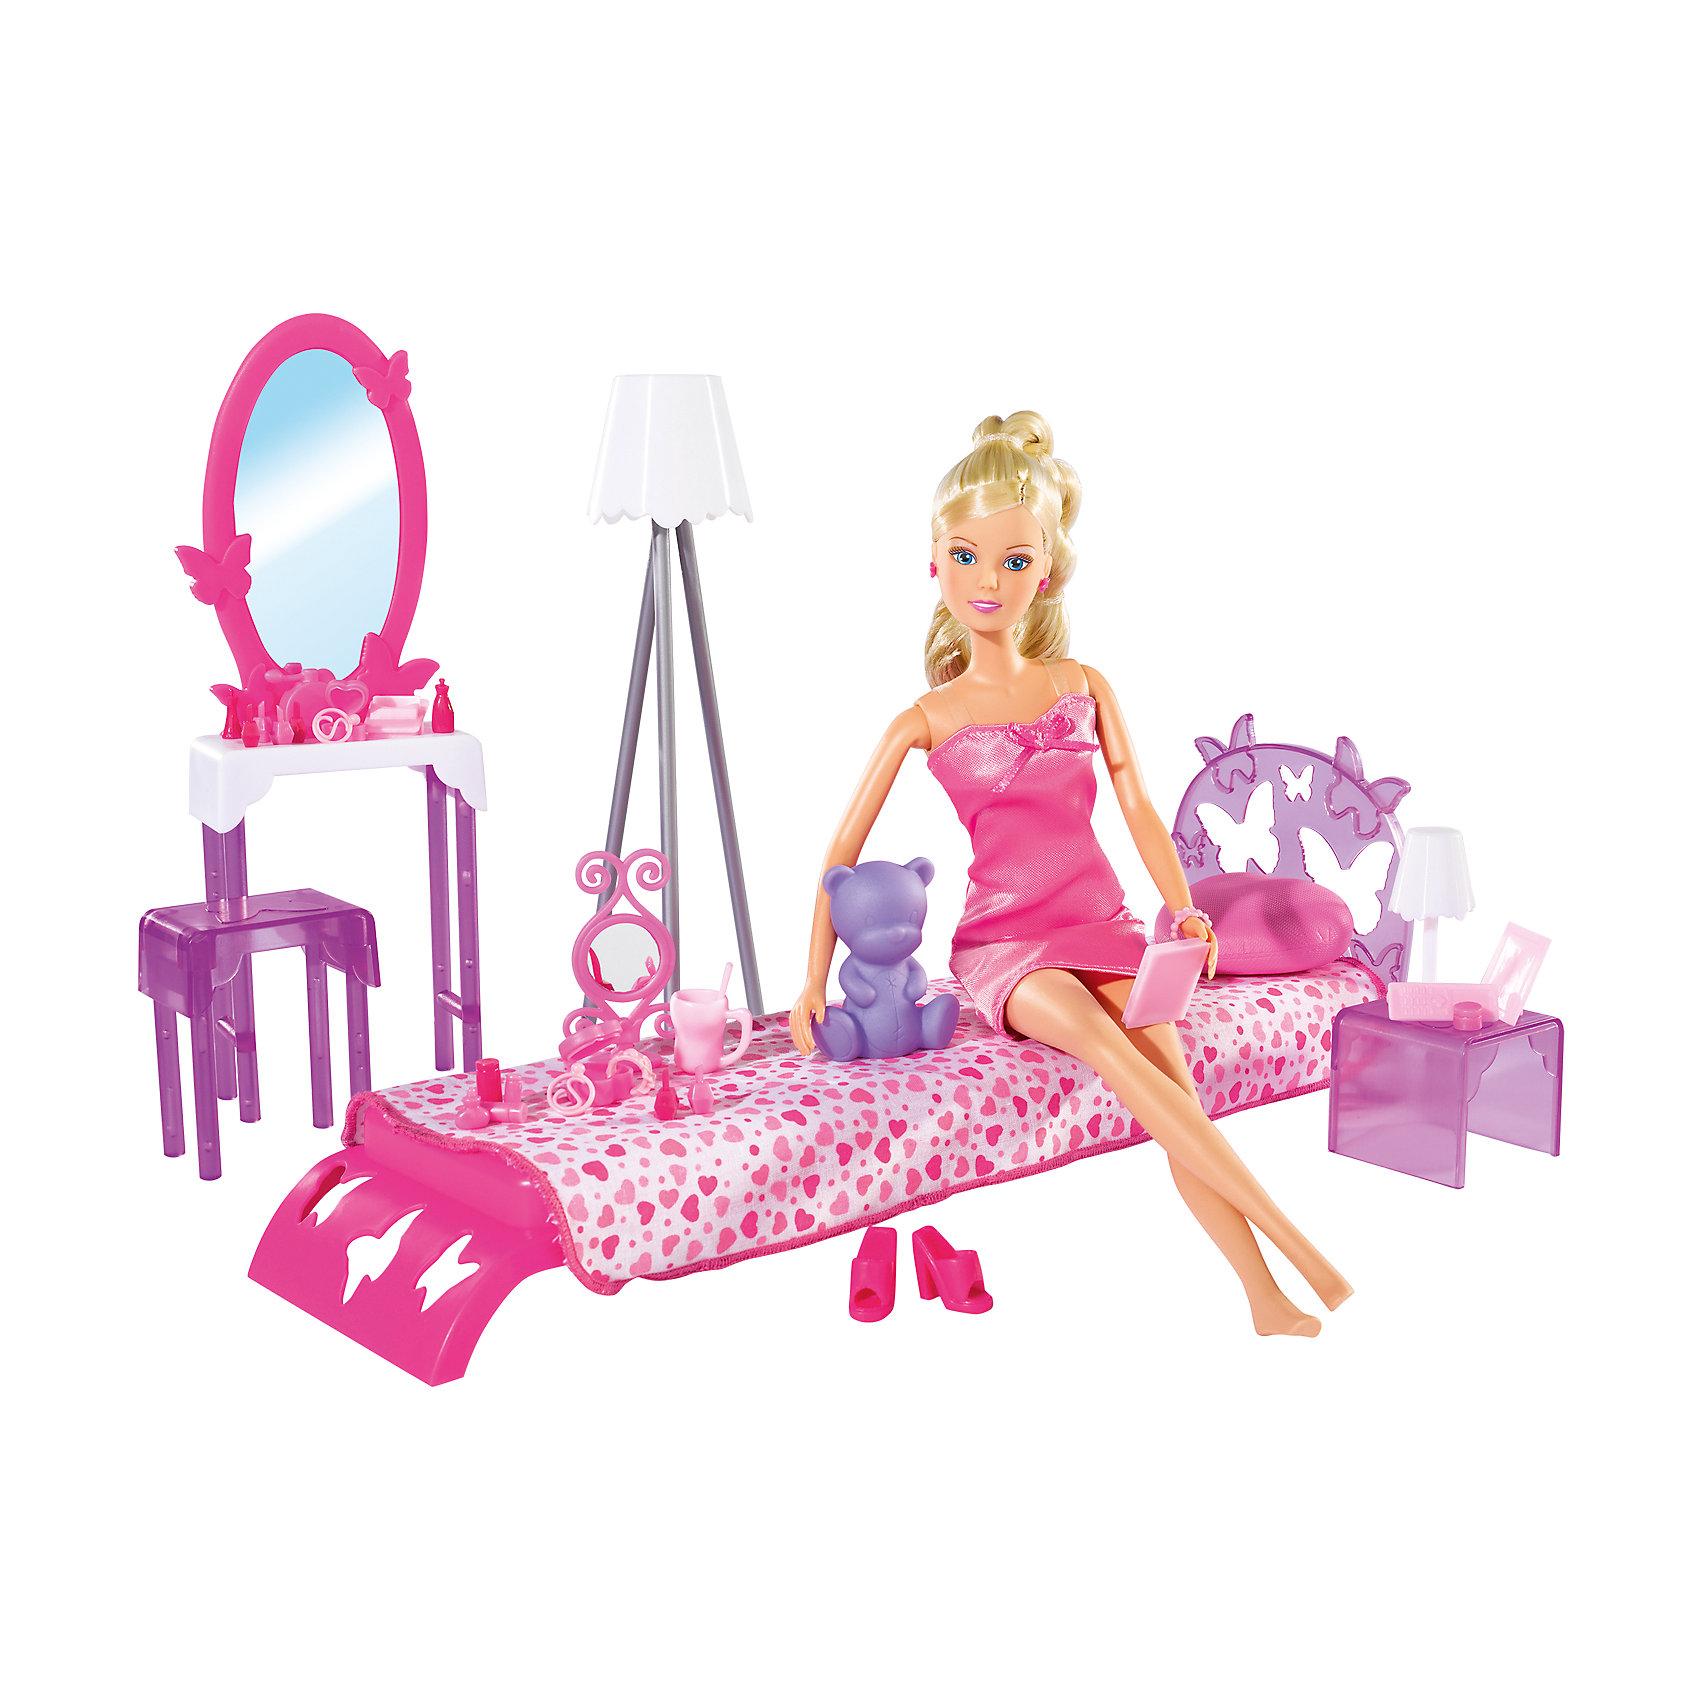 Simba Кукла Штеффи в спальной комнате с аксессуарами, 29 см, Simba кукла simba кукла штеффи супермодель с аксессуарами